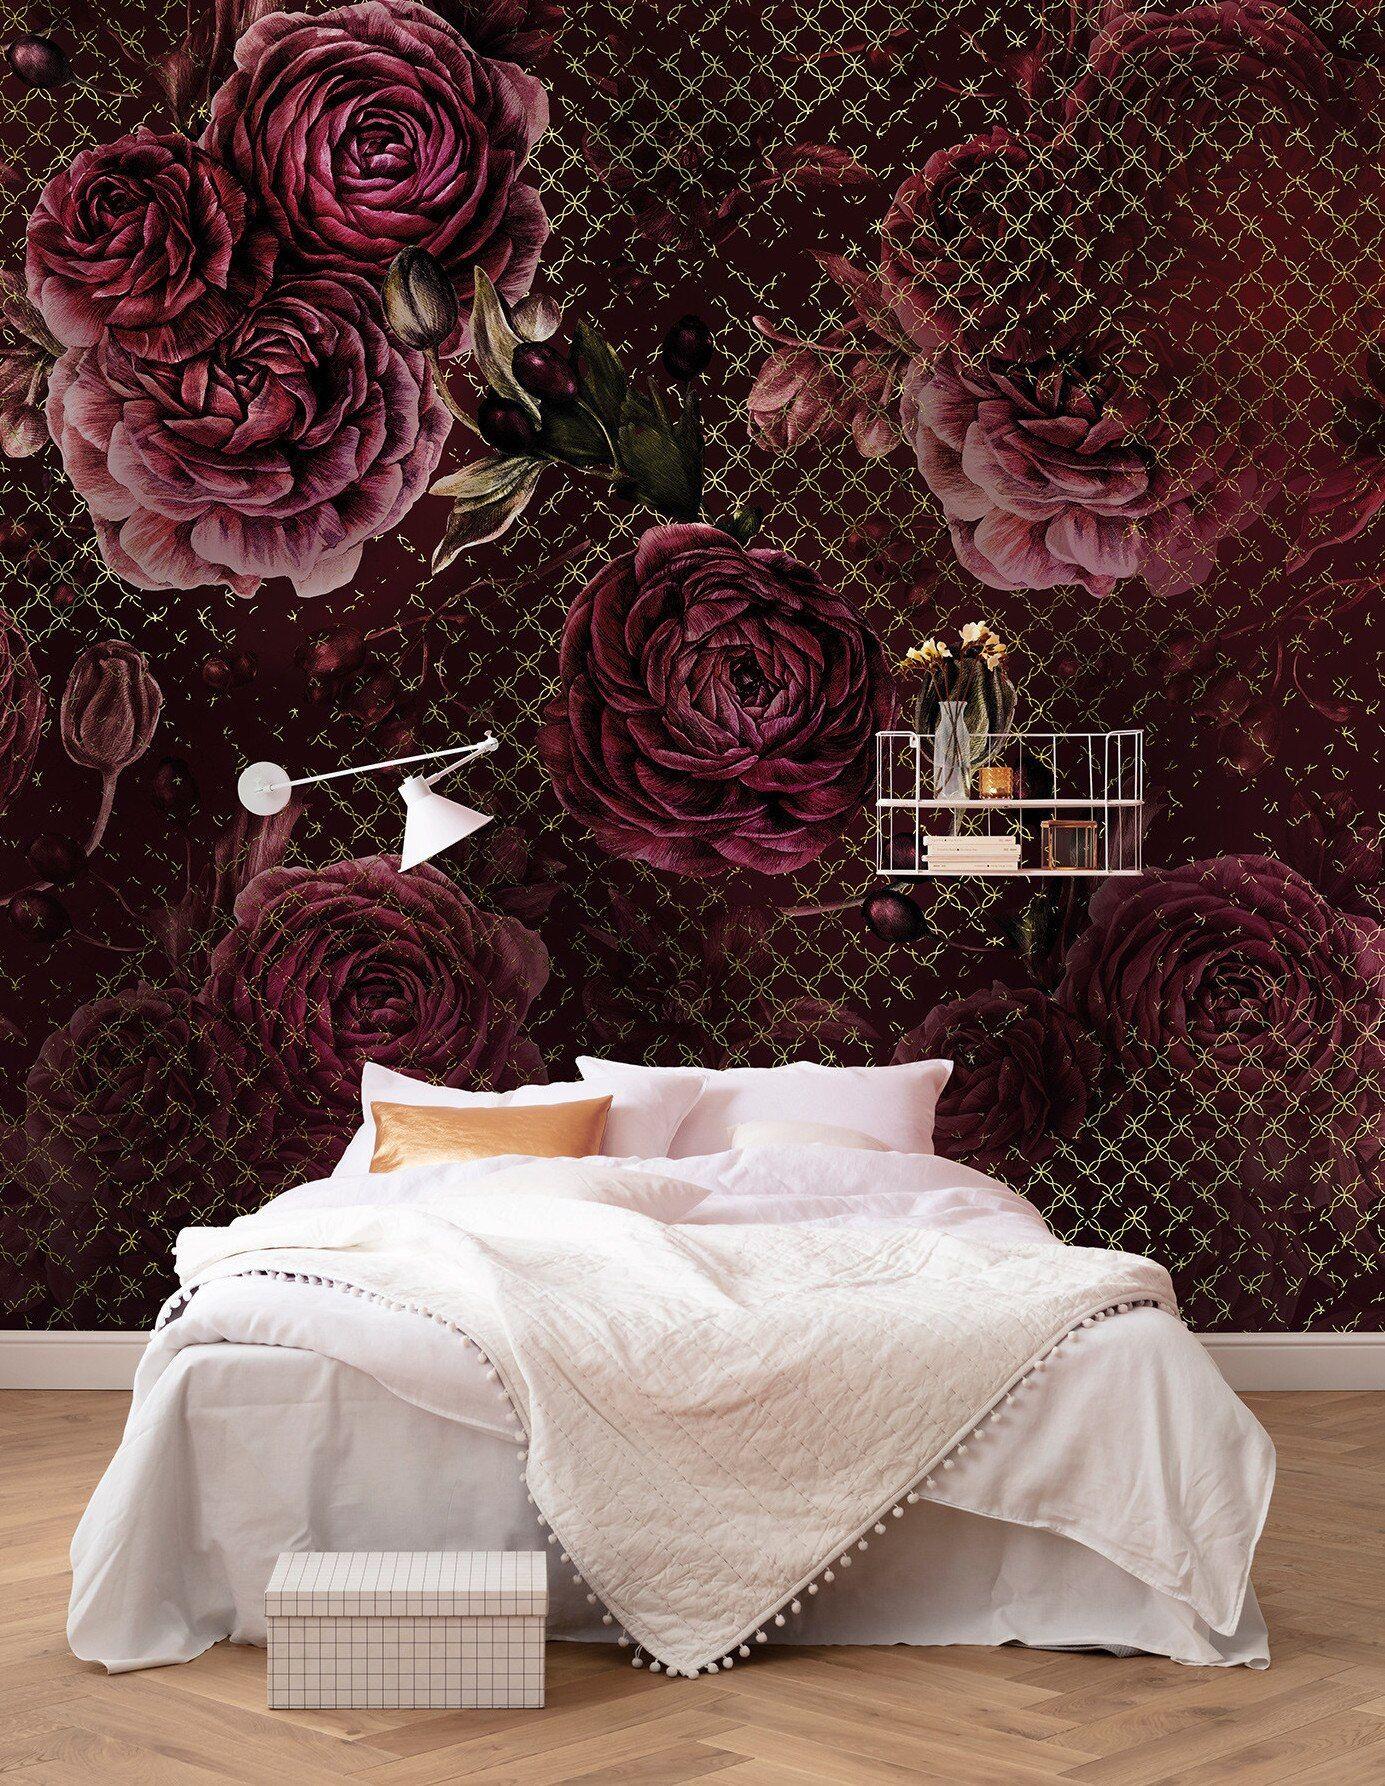 Mural Rouge Intense 3 5m X 2 8m Bedroom Wallpaper Accent Wall Wall Wallpaper Wallpaper Accent Wall